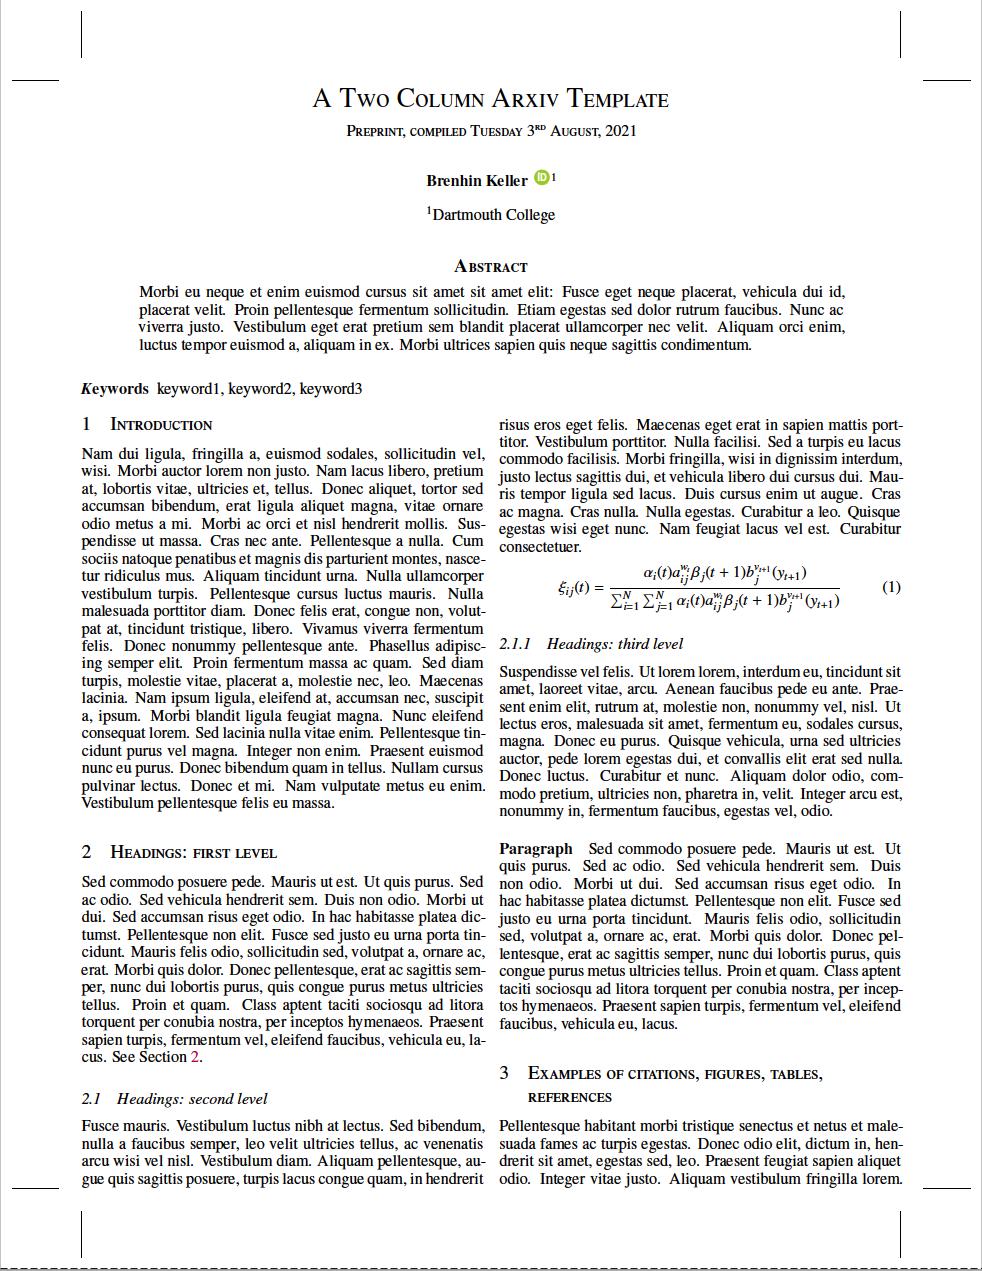 A two column arXiv compatible template